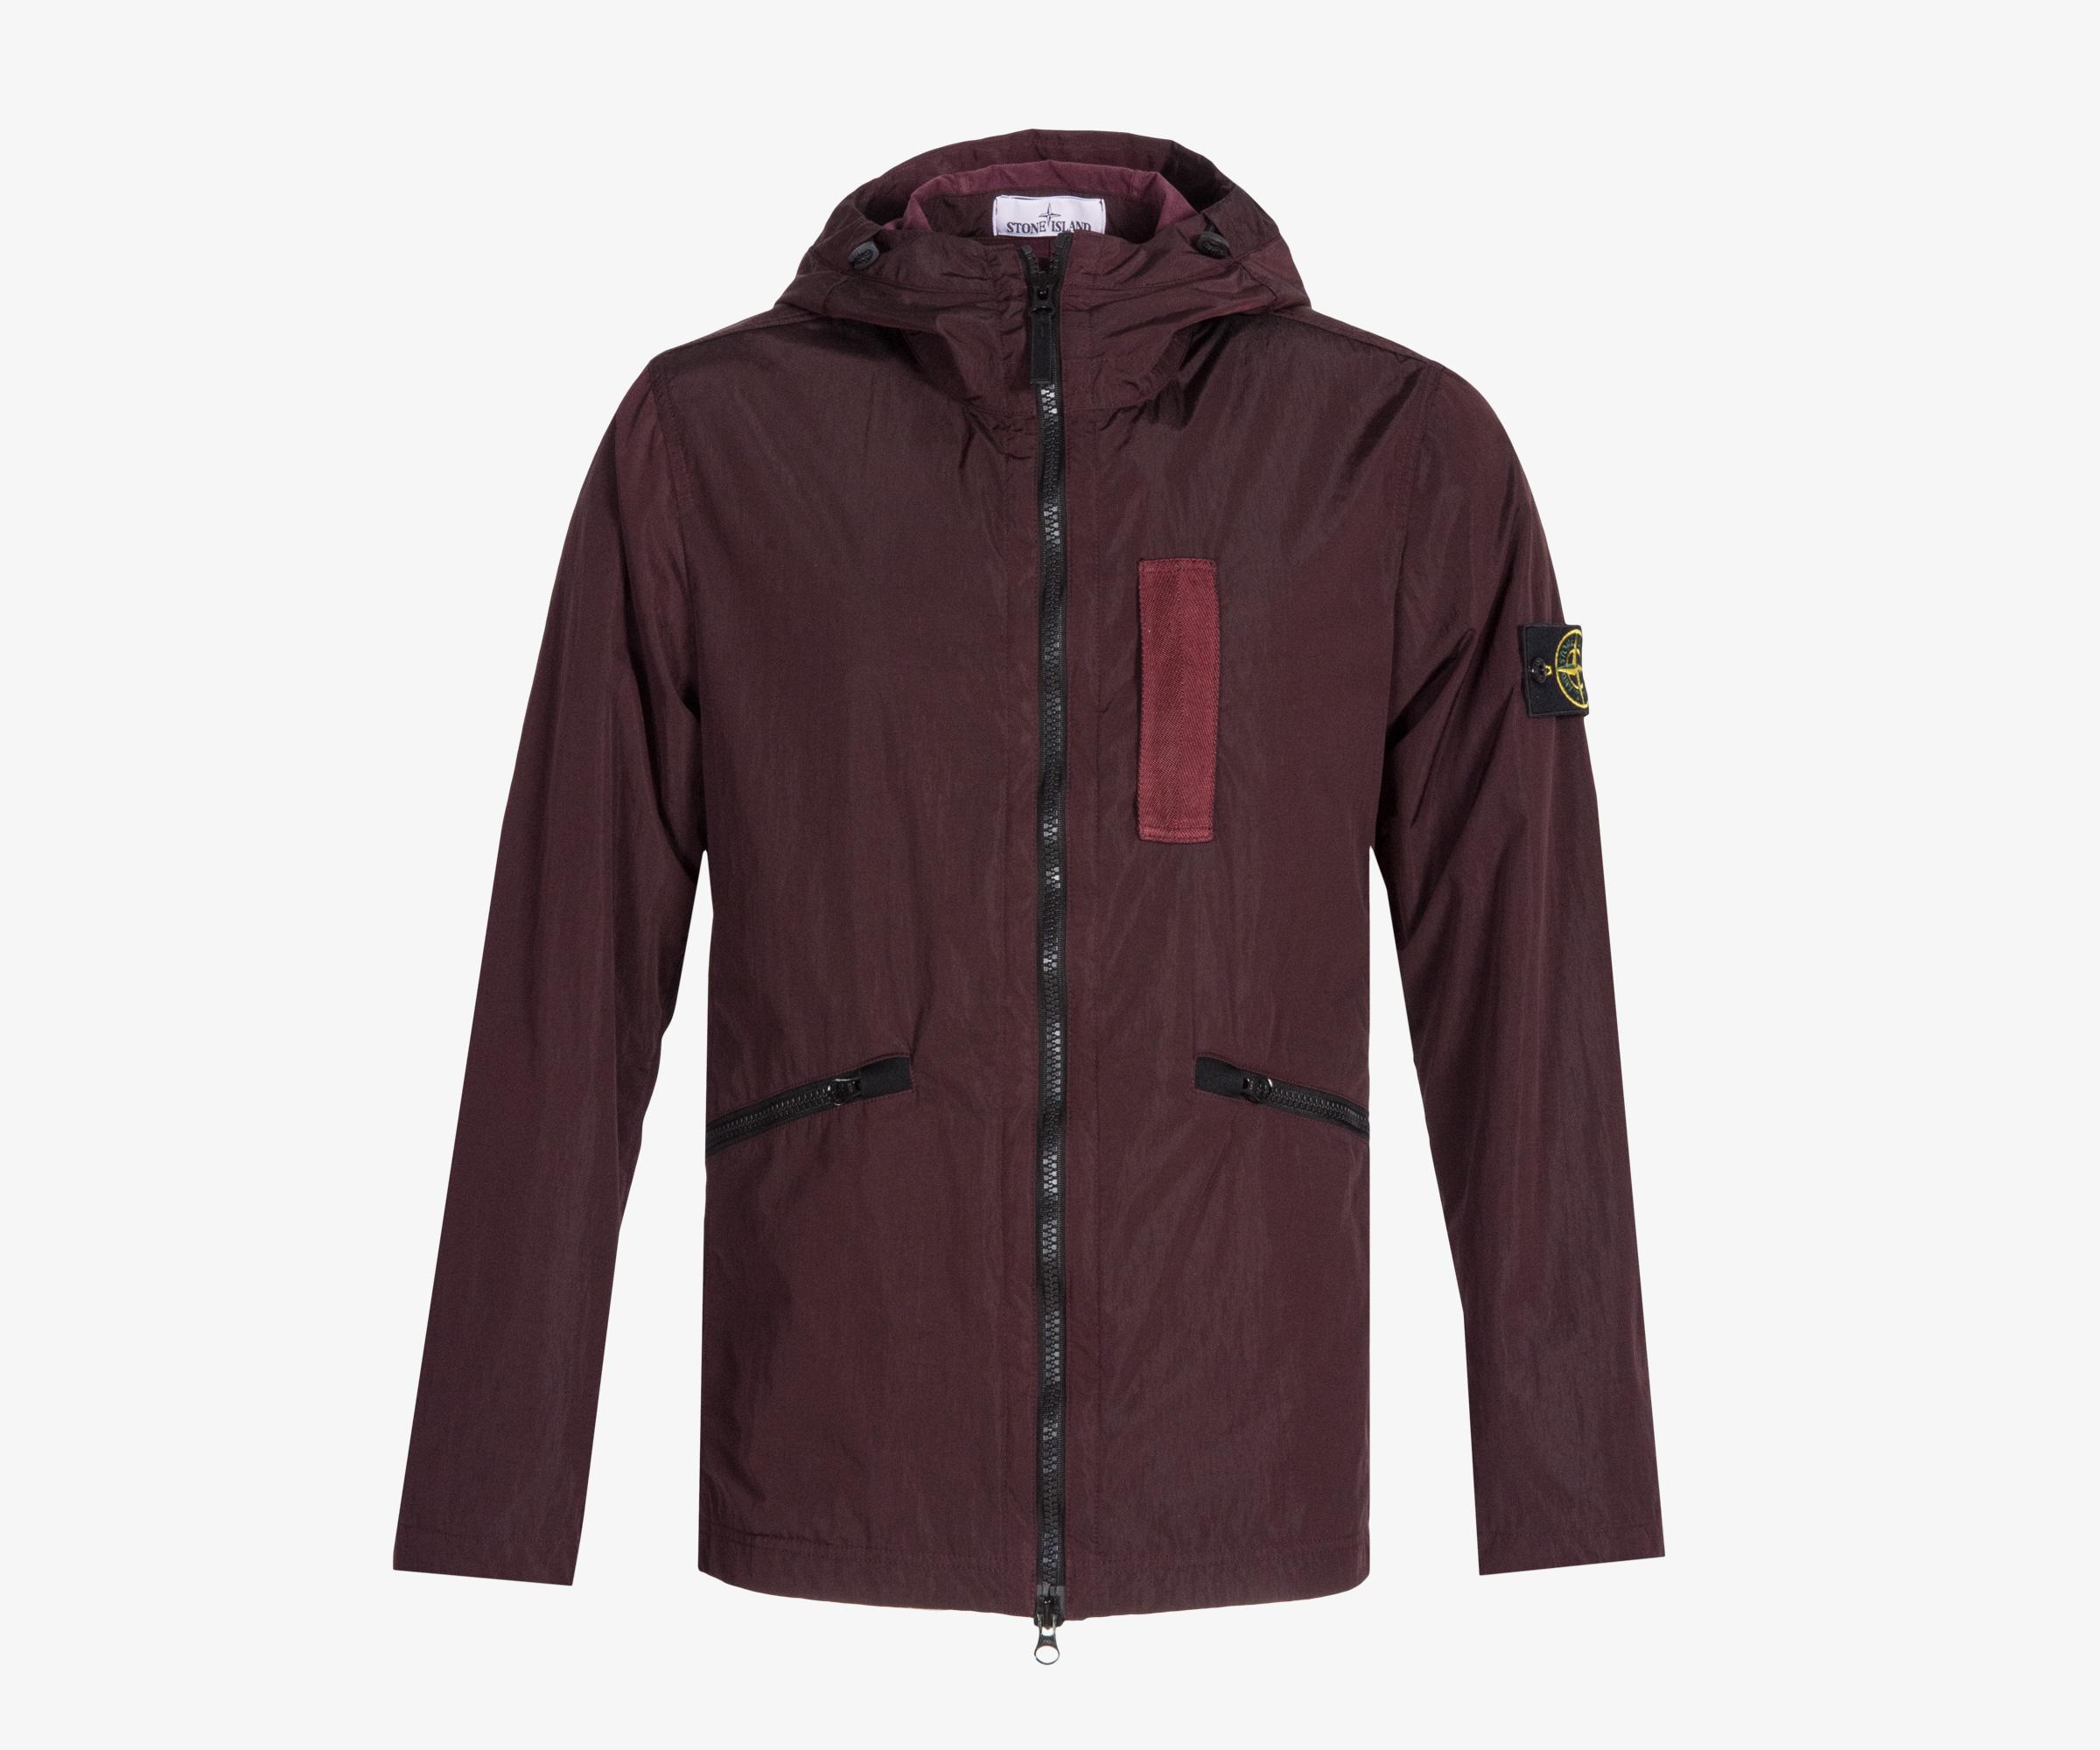 daf3db774 Stone Island Nylon Metal Flock Hooded Jacket Burgundy in Purple for ...